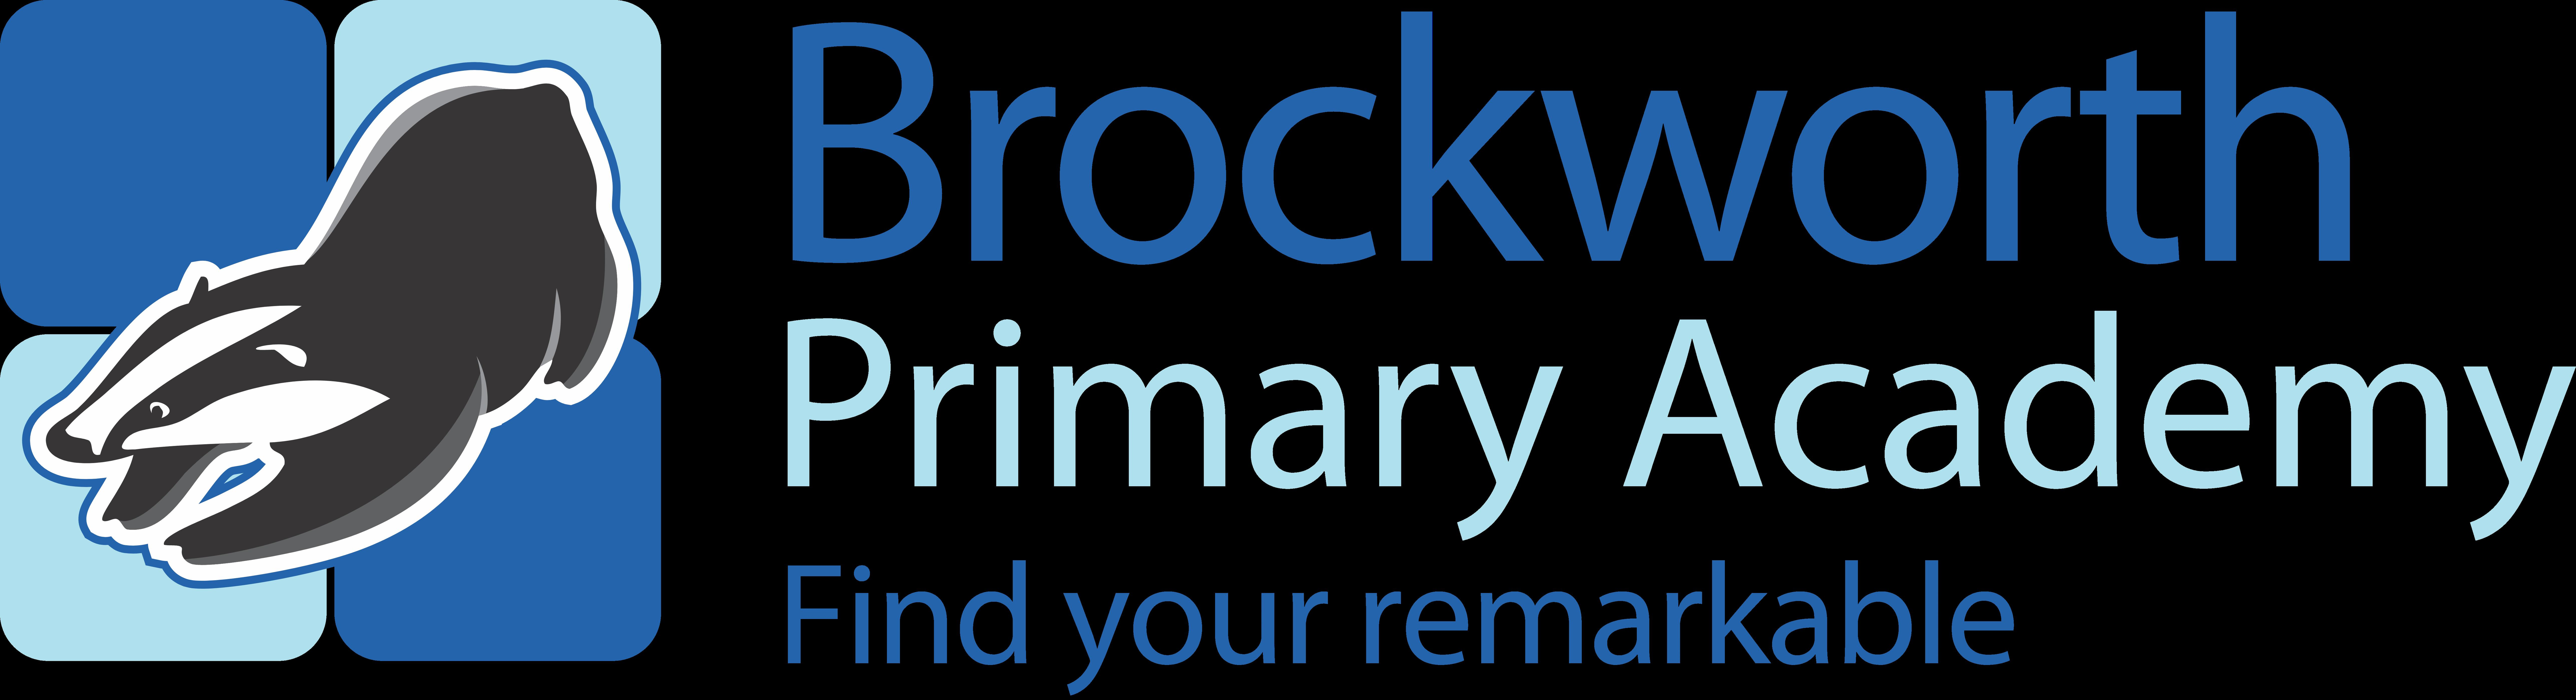 Brockworth Primary Academy